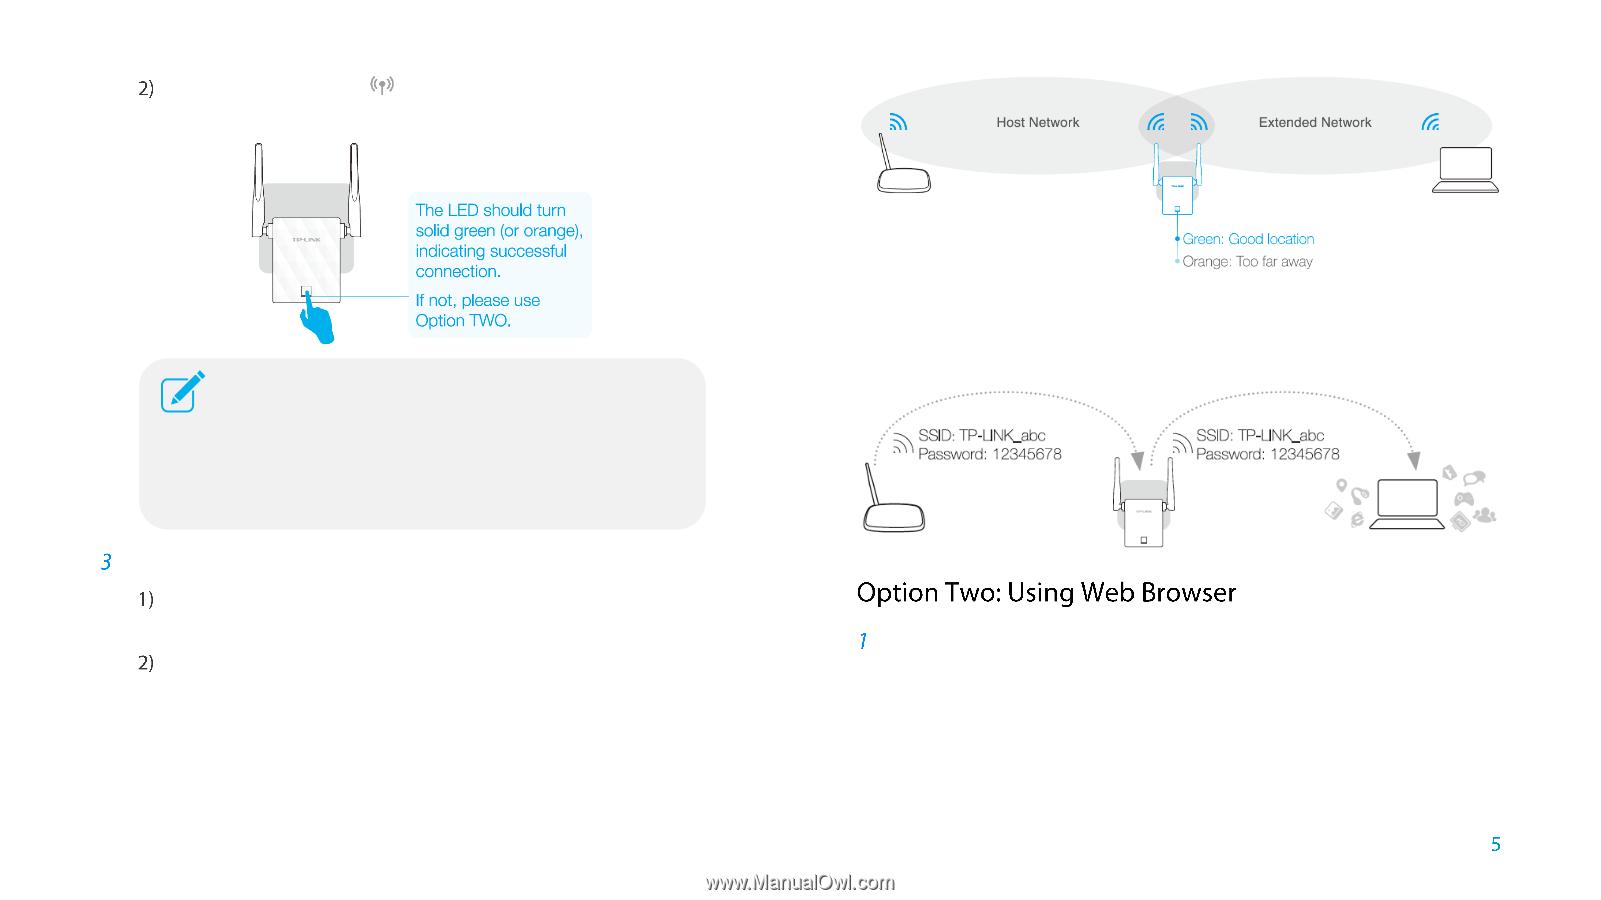 TP-Link TL-WA855RE | TL-WA855RE V1 User Guide - Page 5